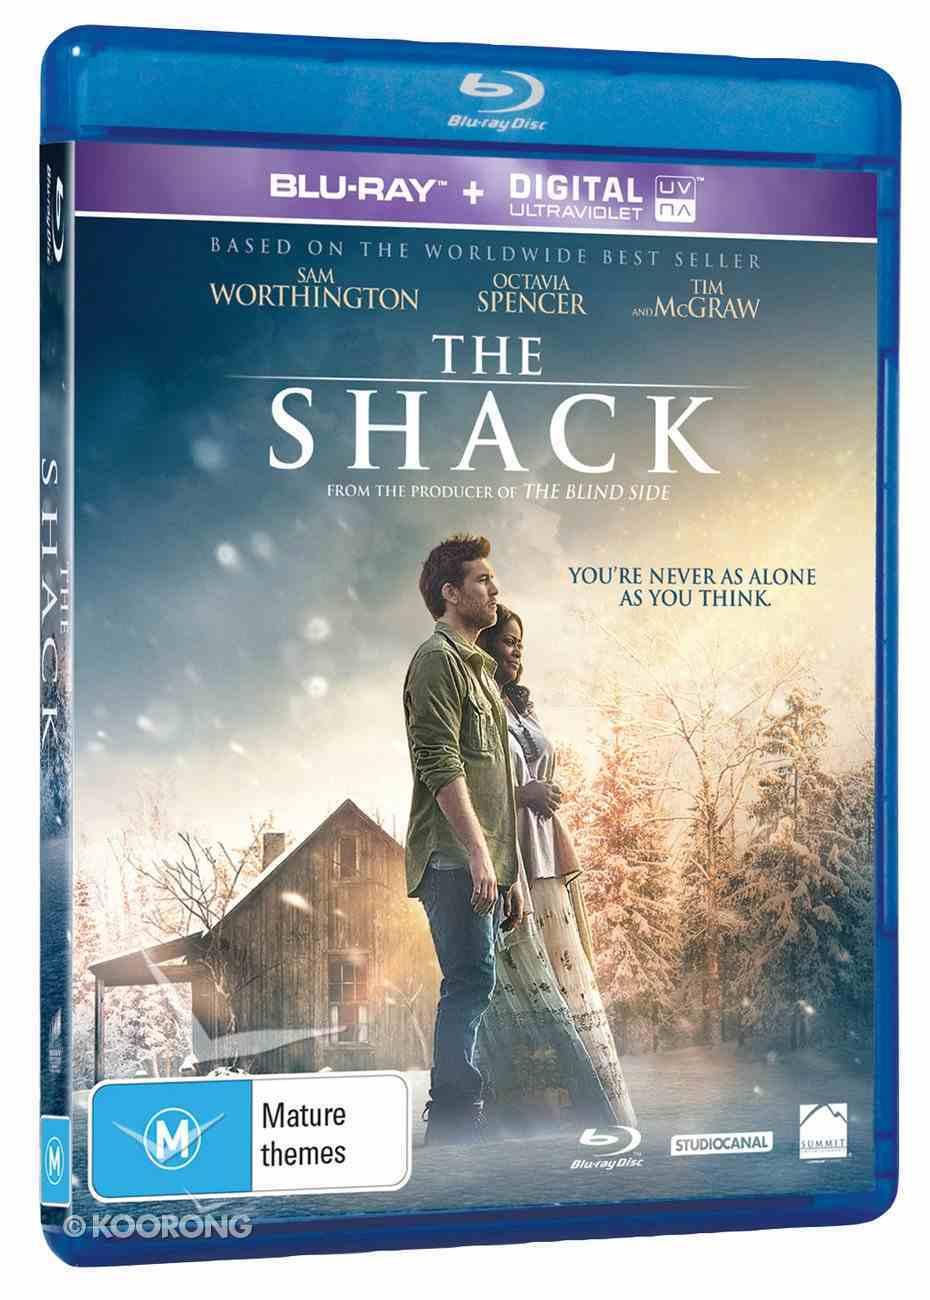 The Shack (Movie Blu-ray) Blu-ray Disc